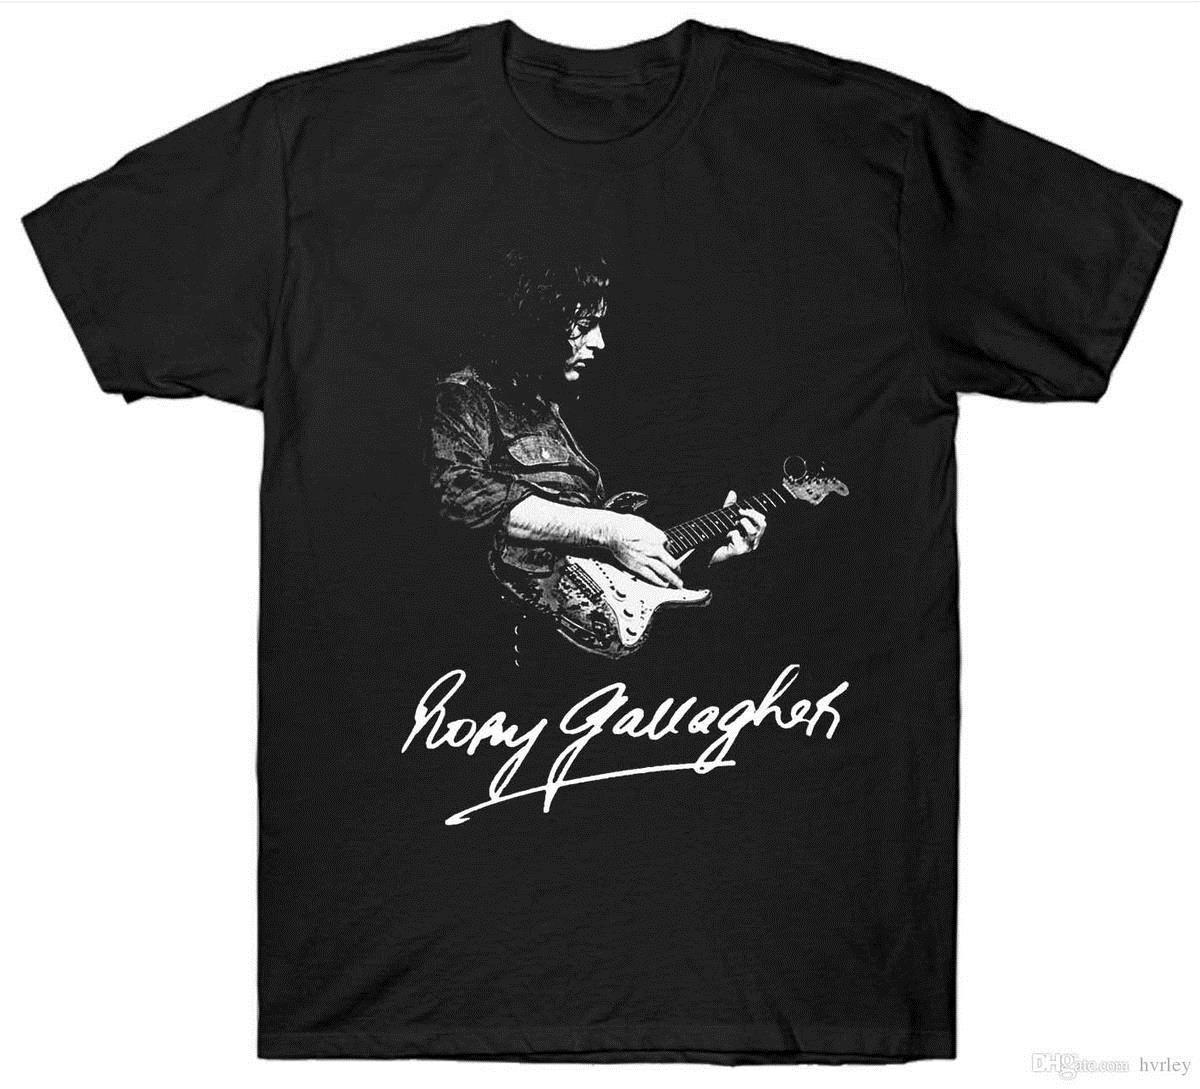 Rory Gallagher T Shirt Gitarist Gitaar 1970 S 1980 S Retro Vintage